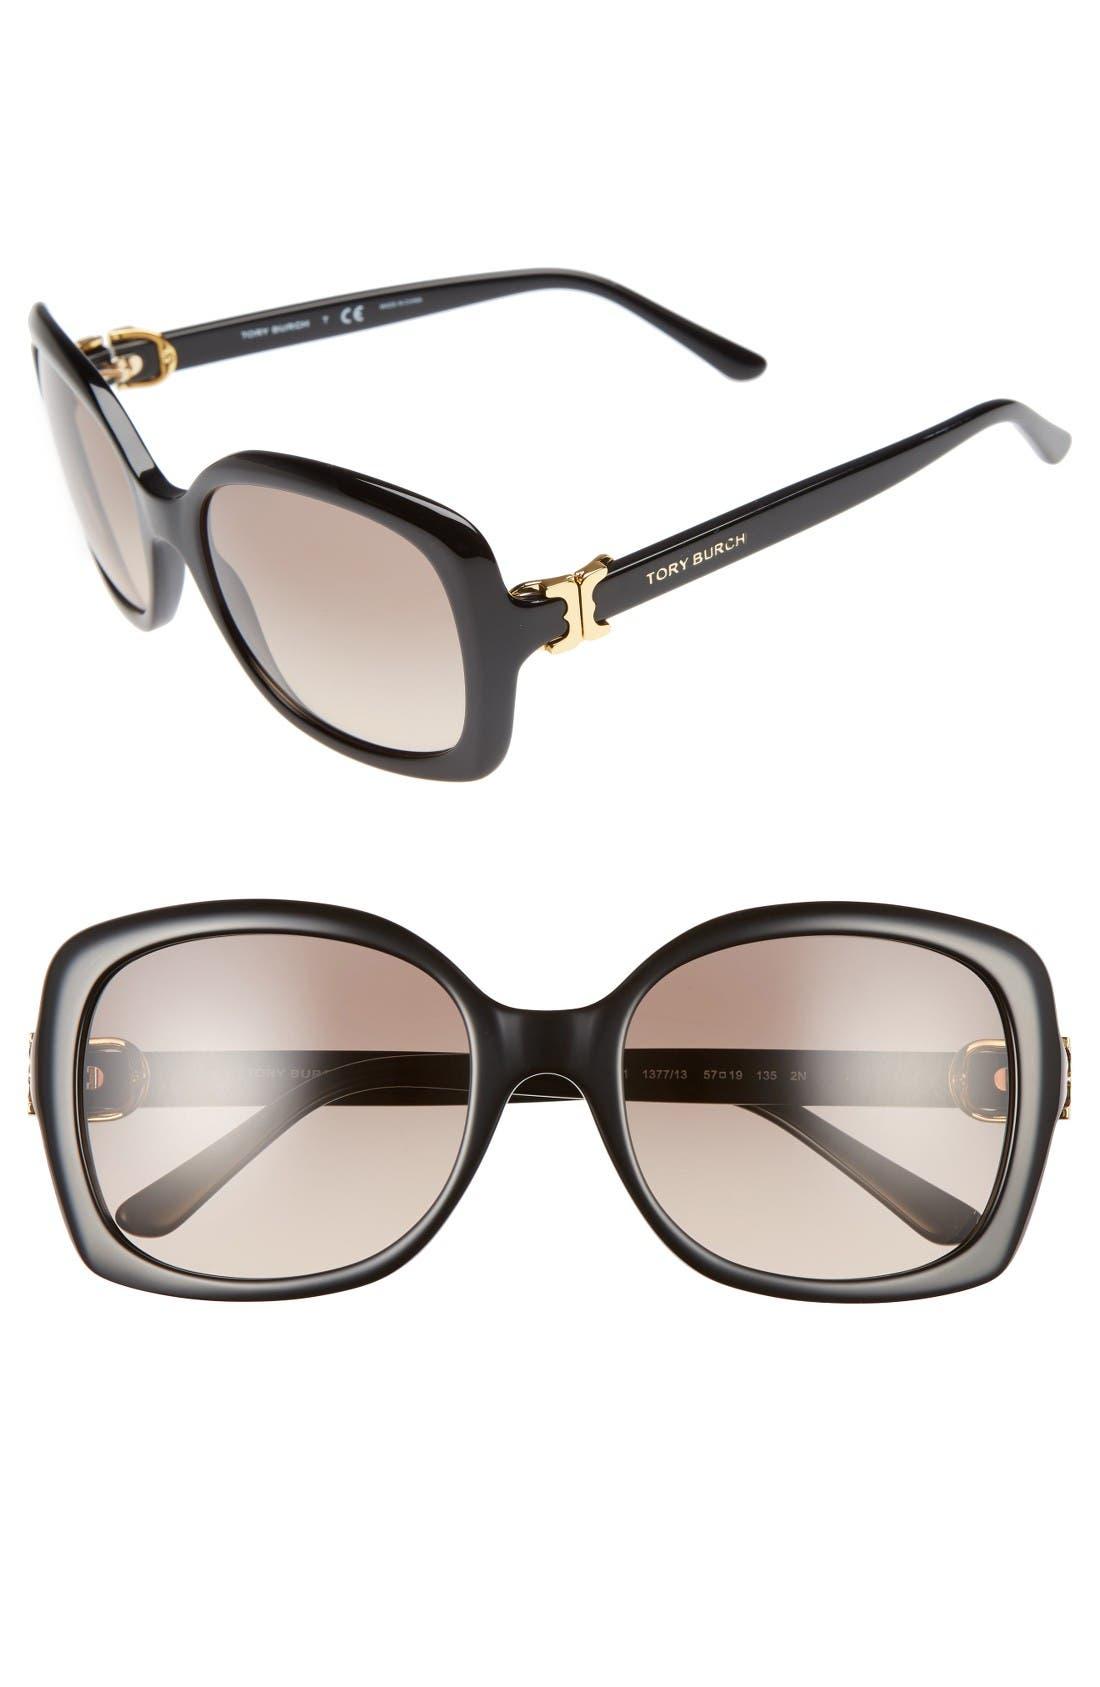 57mm Oversized Sunglasses,                         Main,                         color, Black